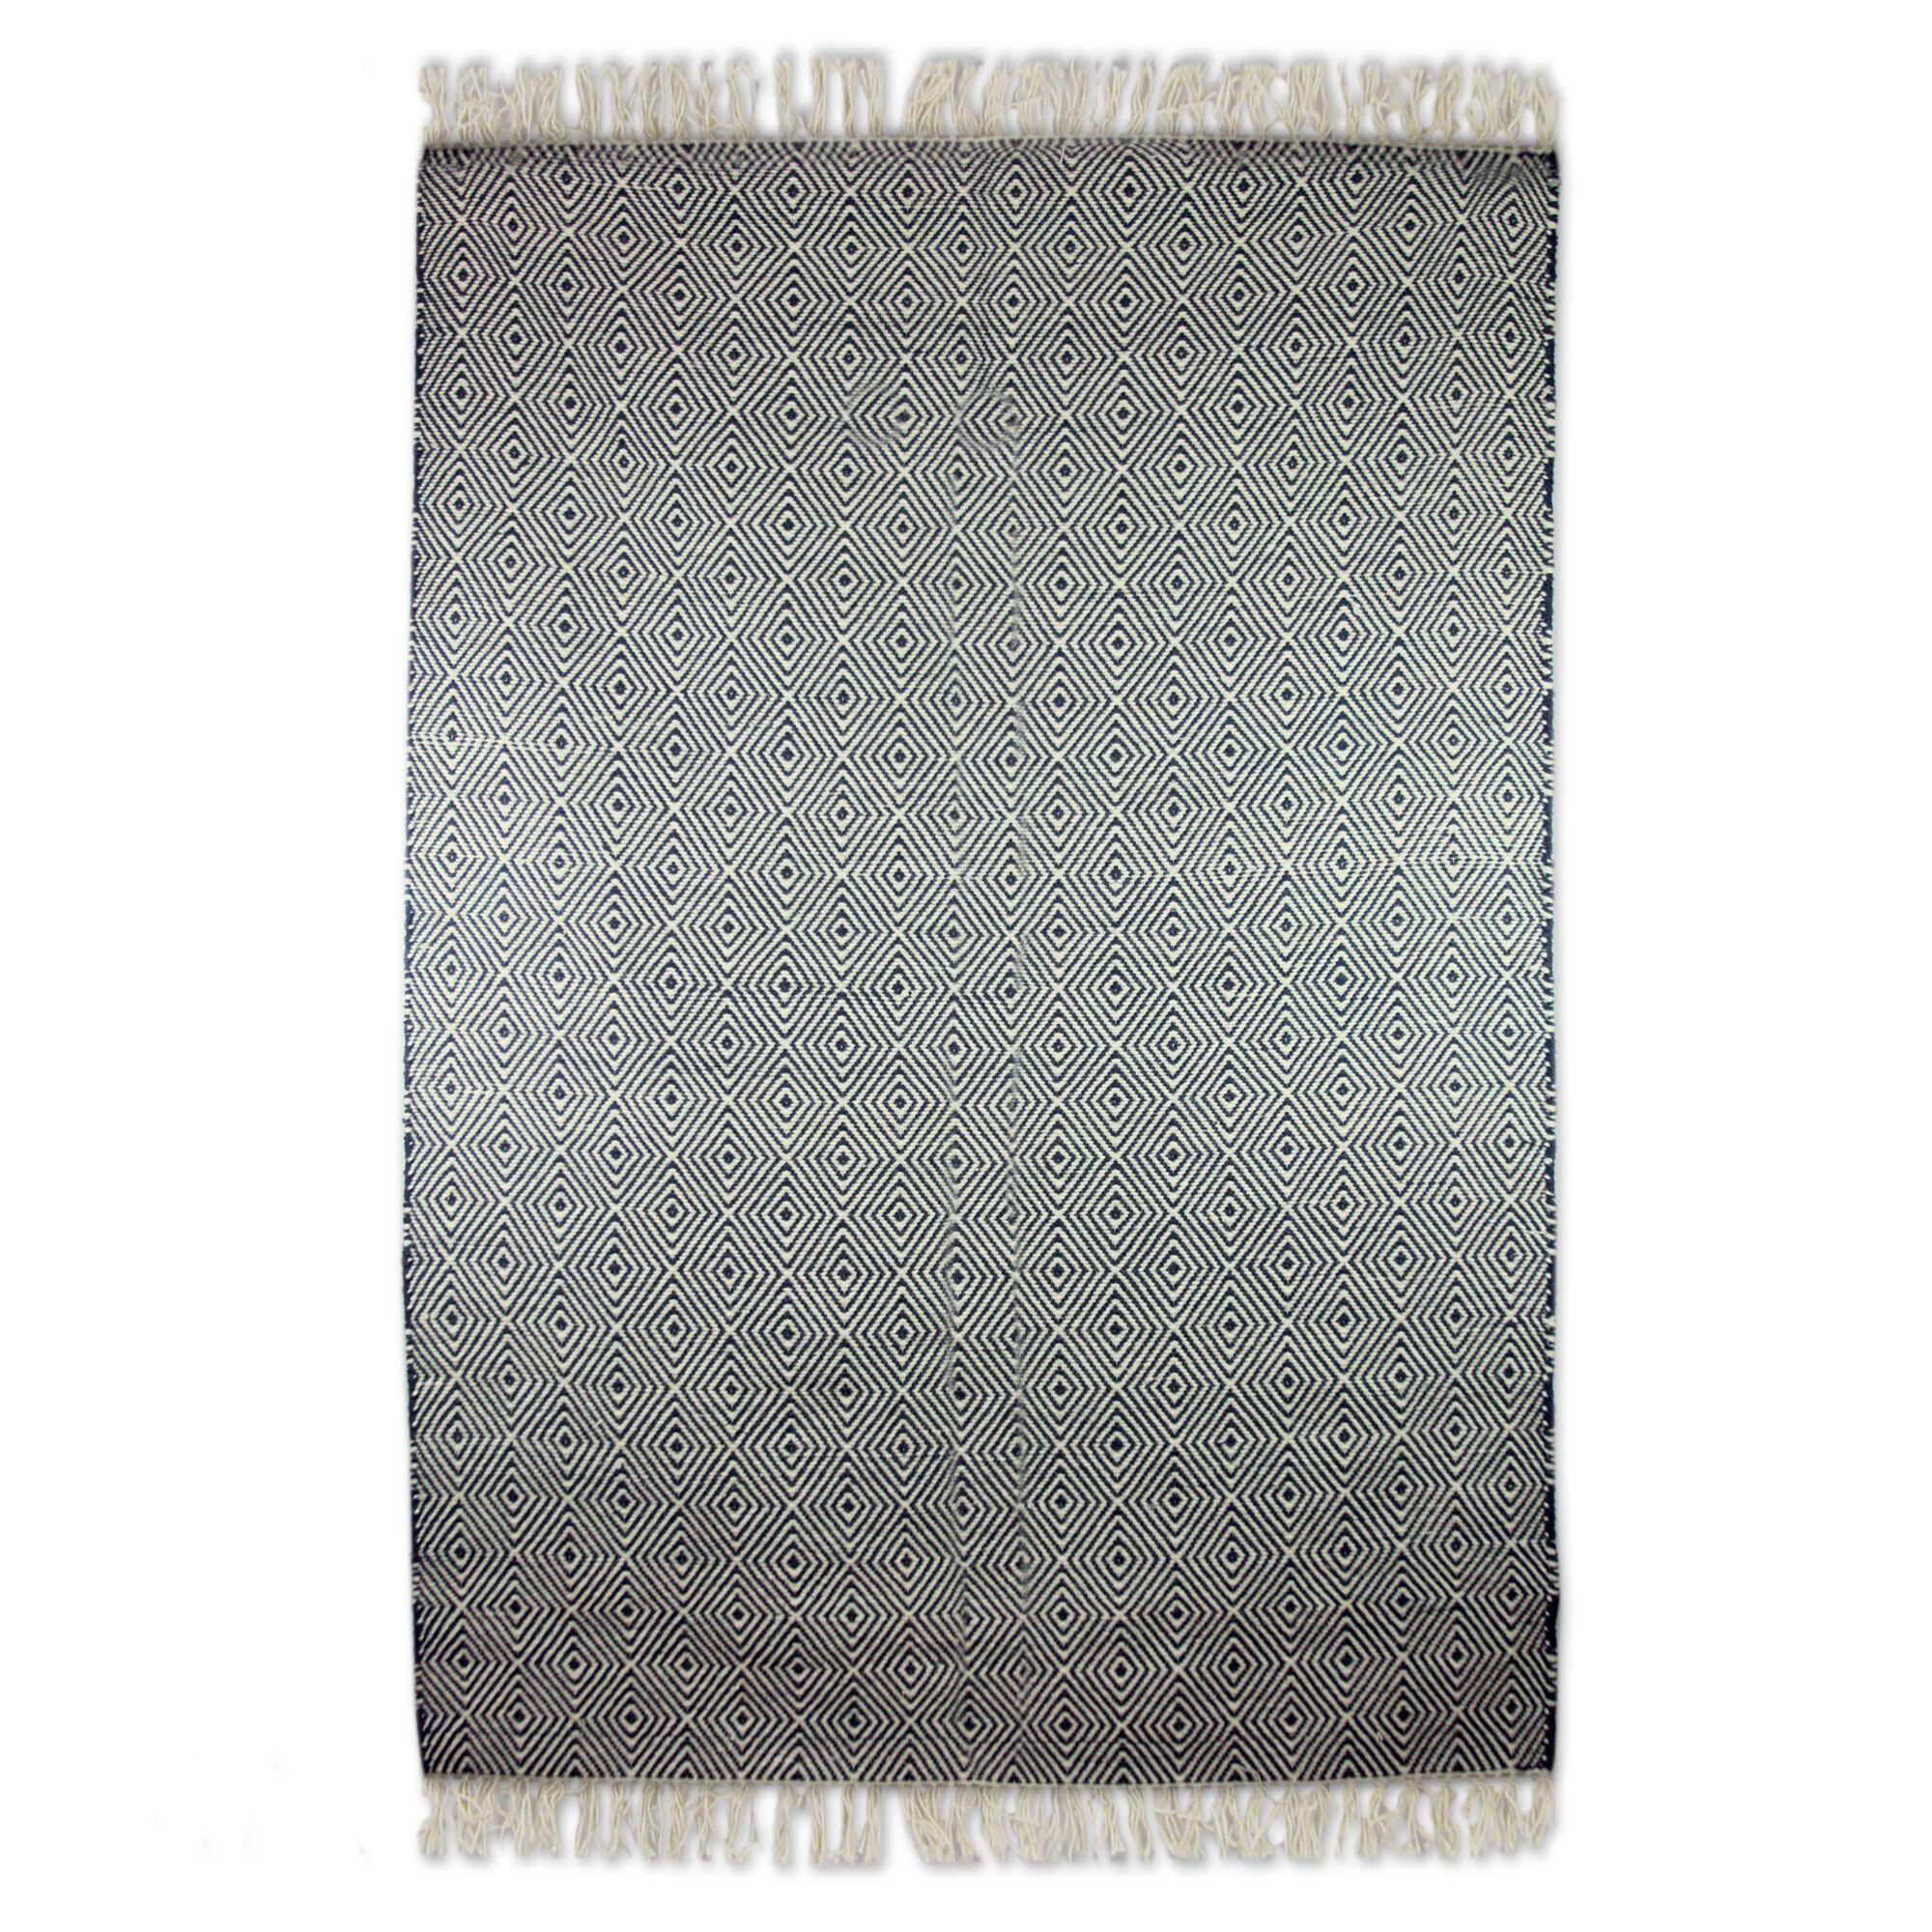 Redmond Mesmerizing Diamonds Dhurrie Hand-Woven Wool Gray Area Rug